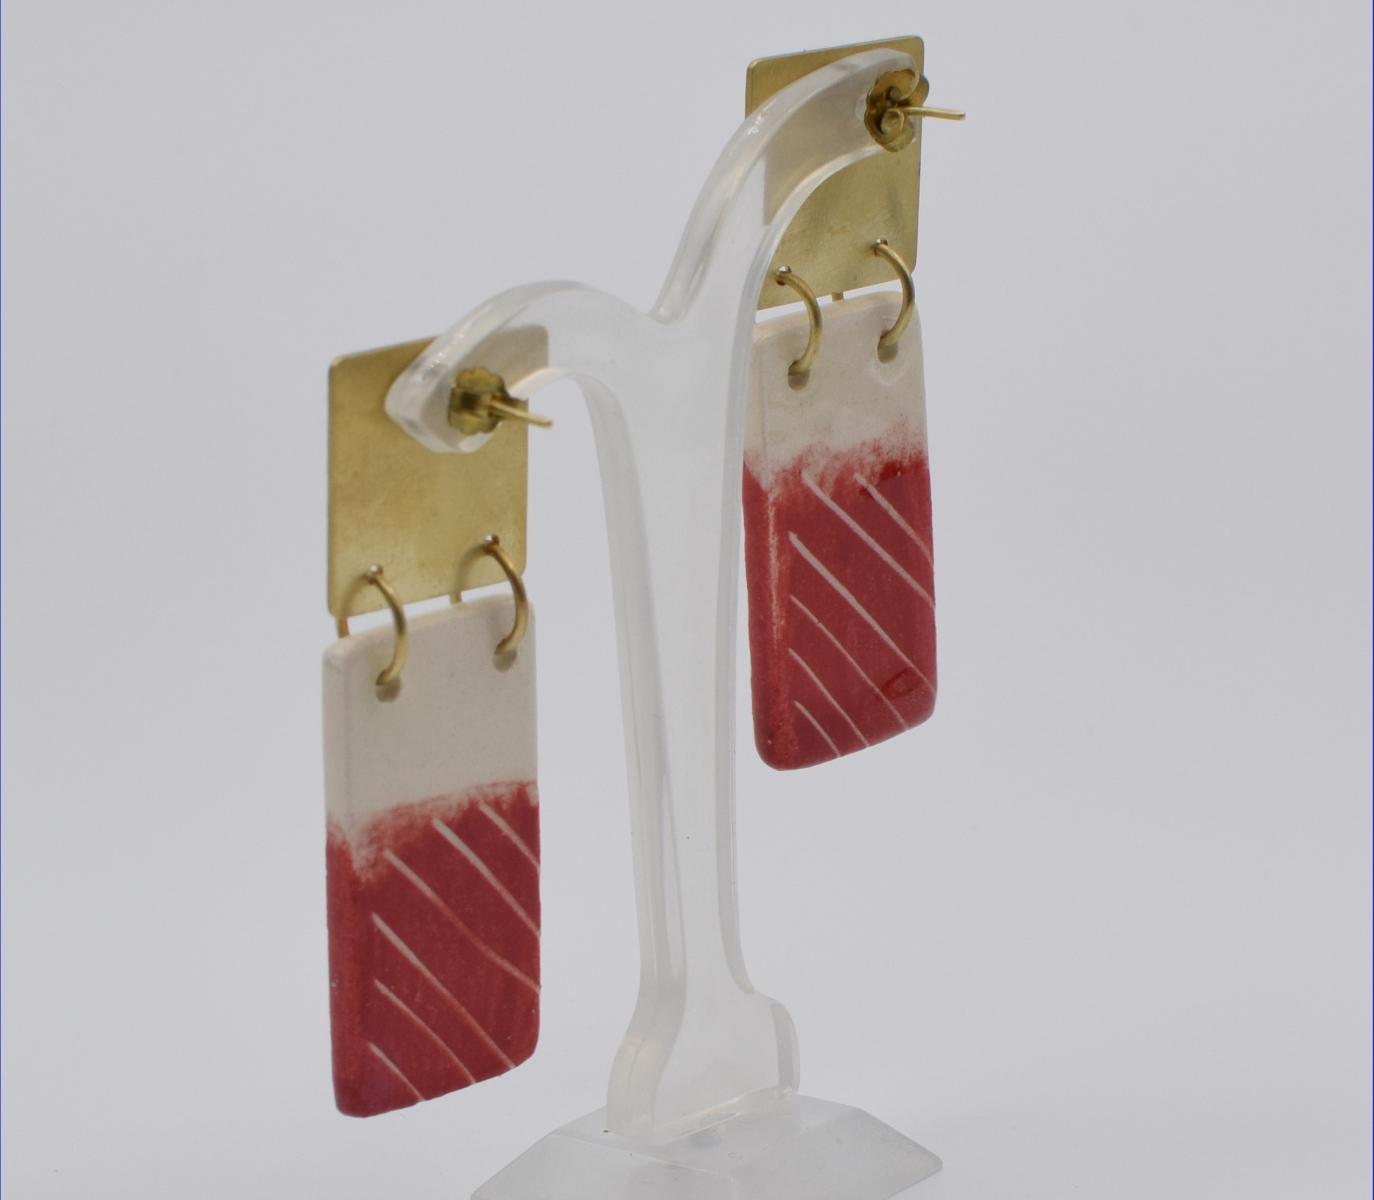 Boucle-Graphic-ceramique-laitonRouge1